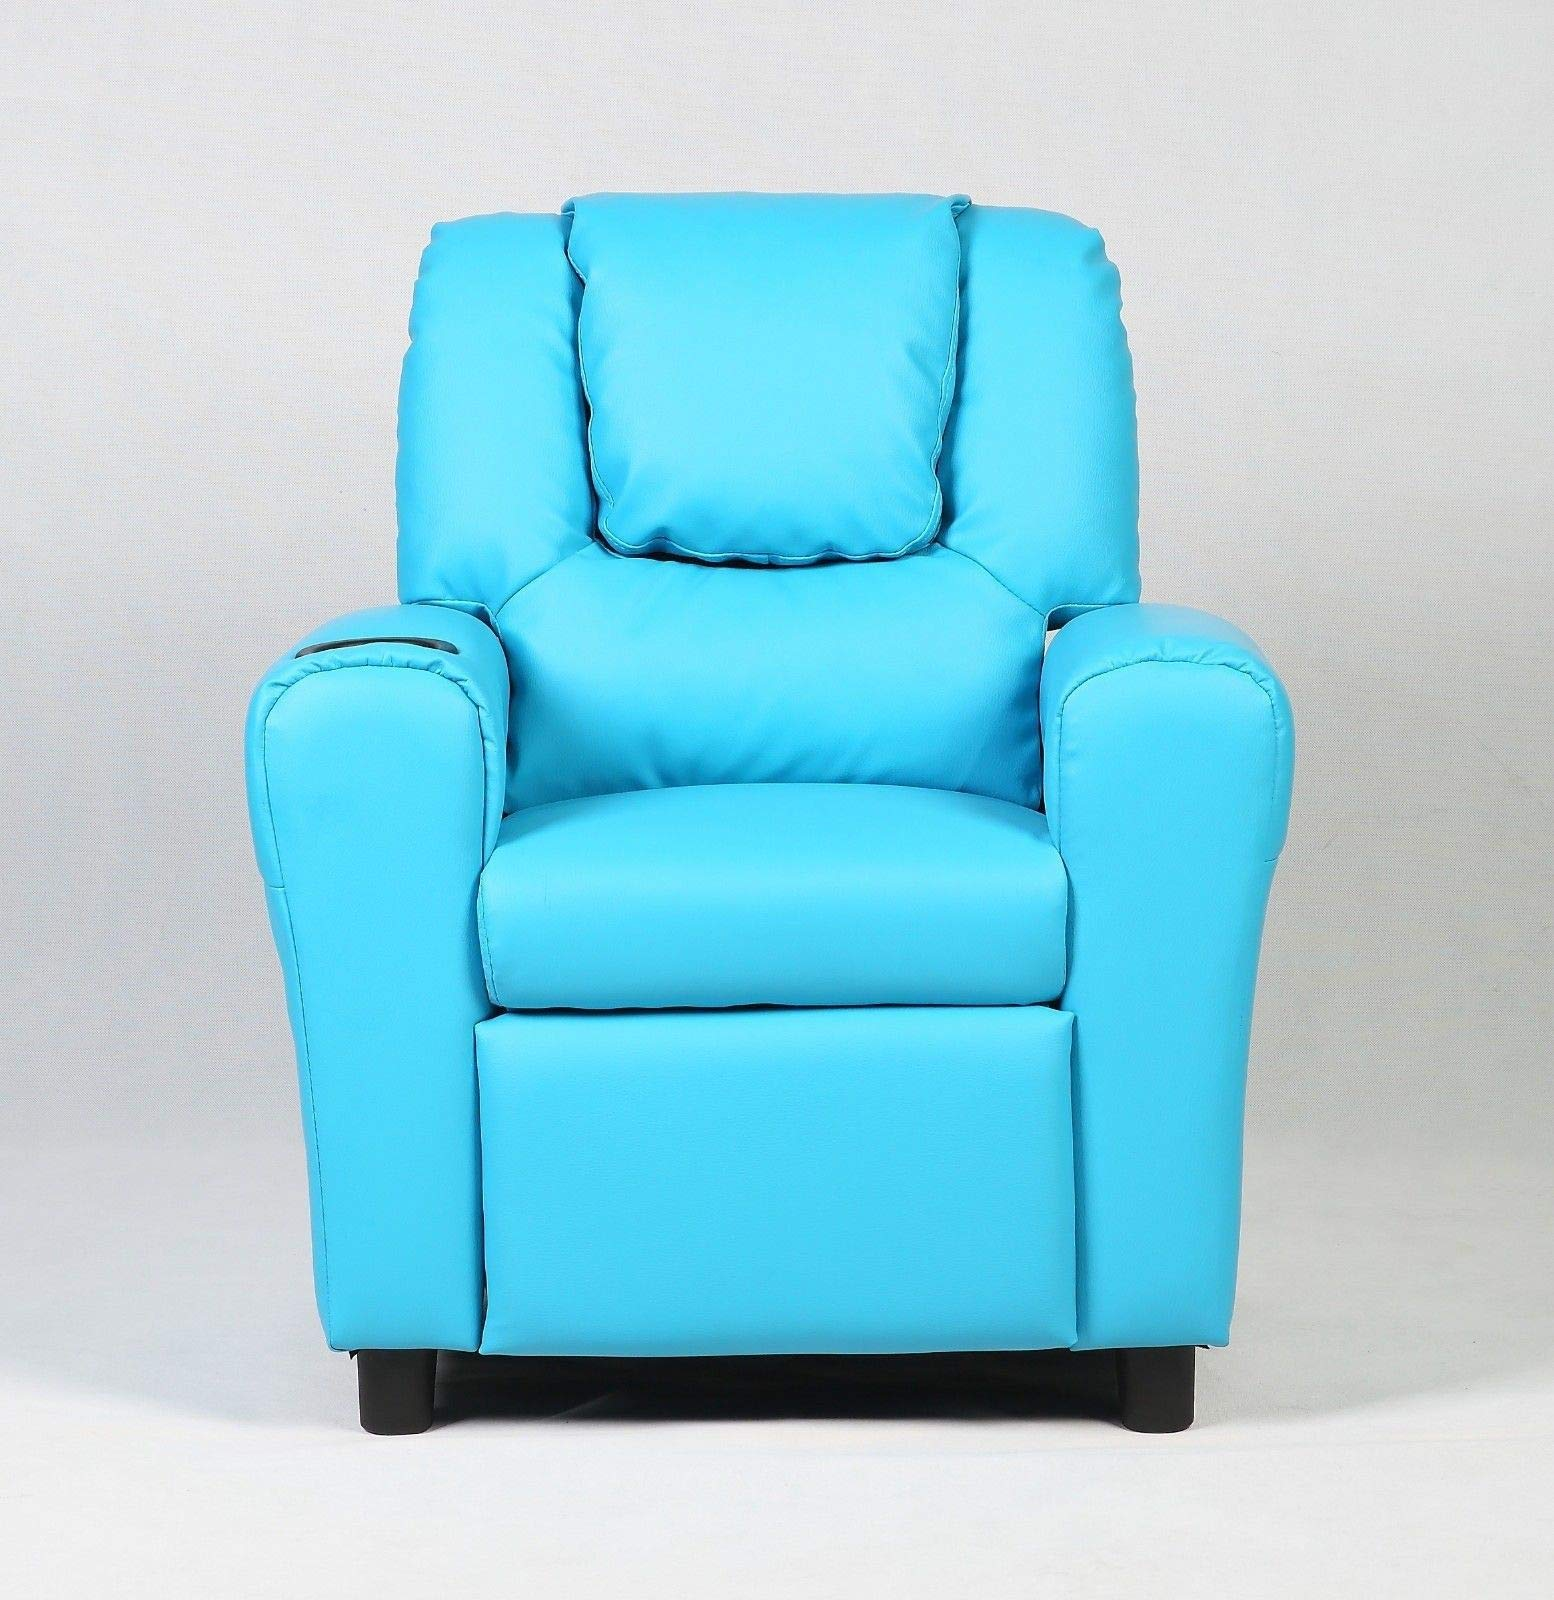 GHP 132-Lbs Capacity Blue PU Sponge & Wood Good Balance Function Kids Recliner Sofa by Globe House Products